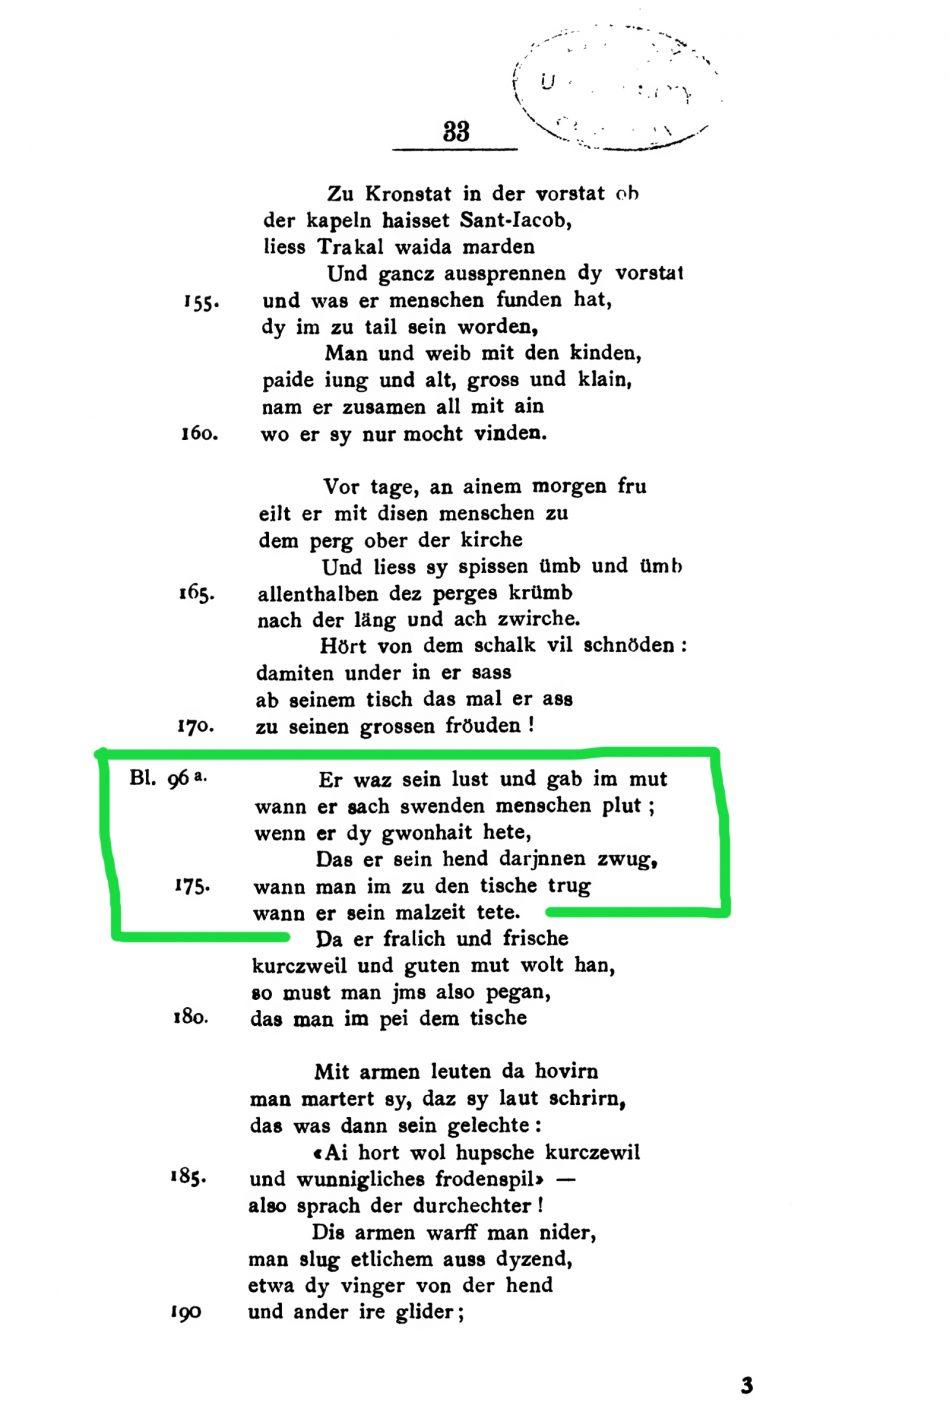 Page 33 of Conduratu's dissertation